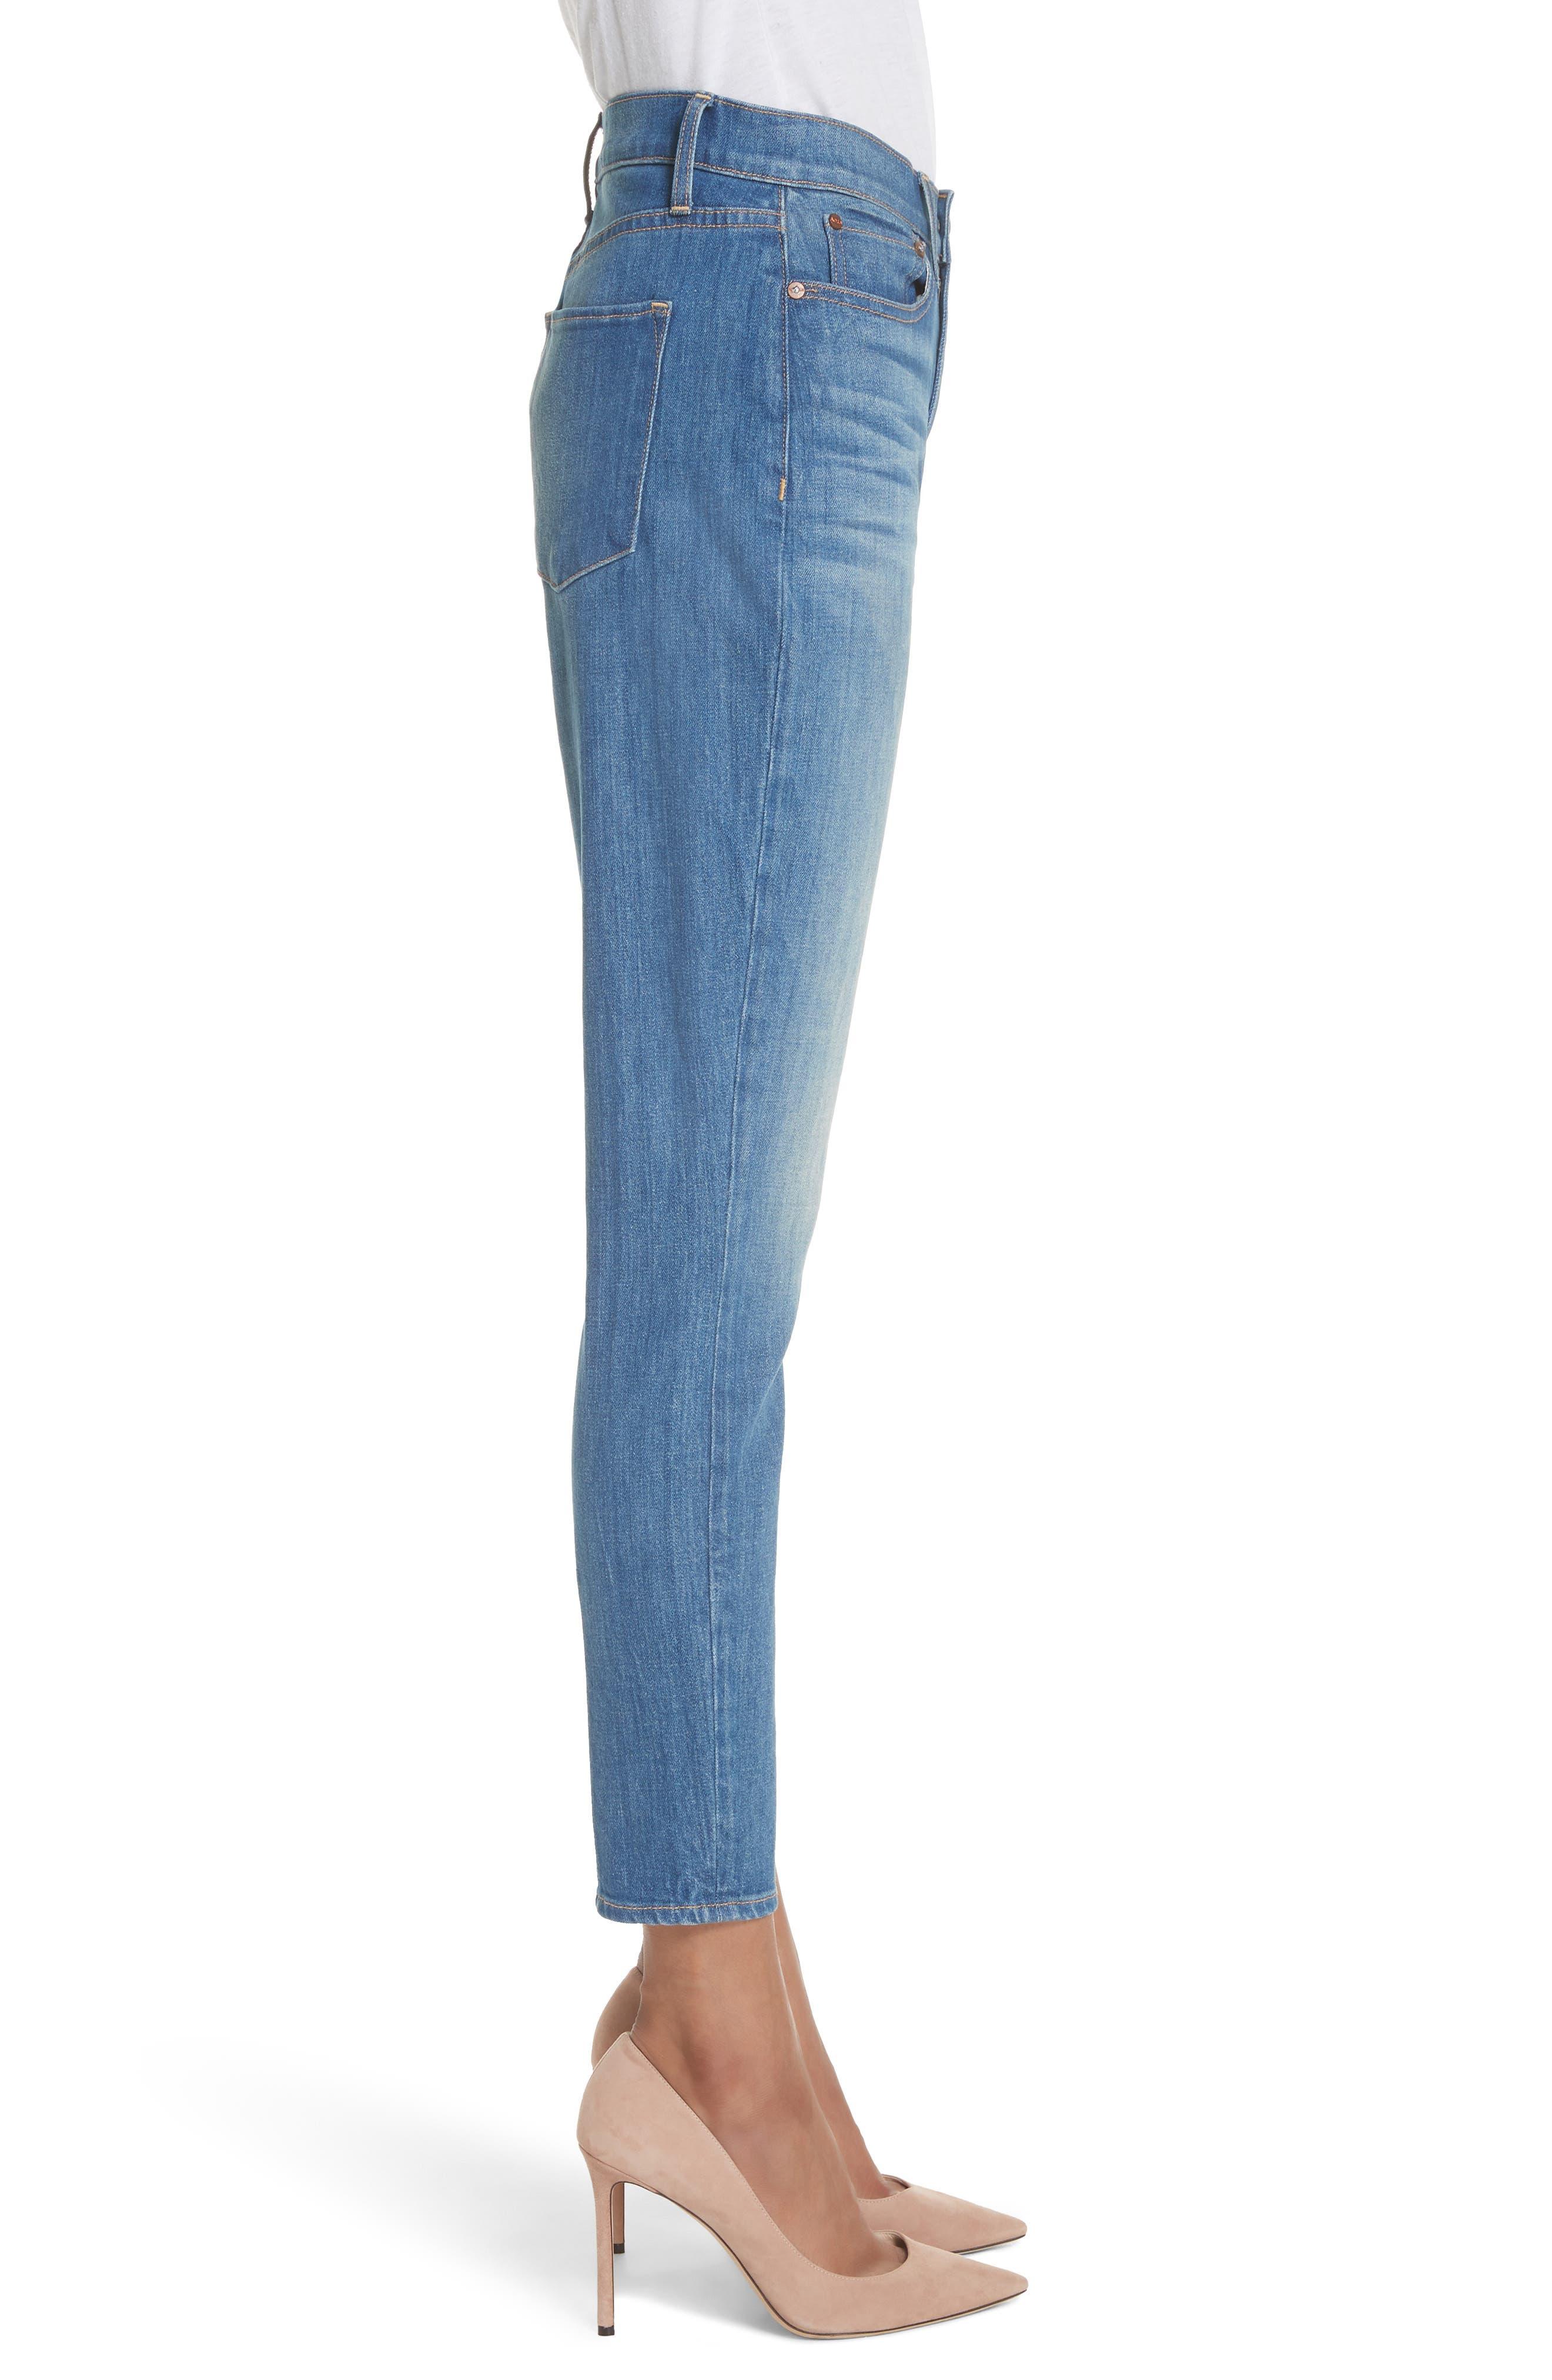 AO.LA Good High Waist Ankle Skinny Jeans,                             Alternate thumbnail 3, color,                             Side Hustle